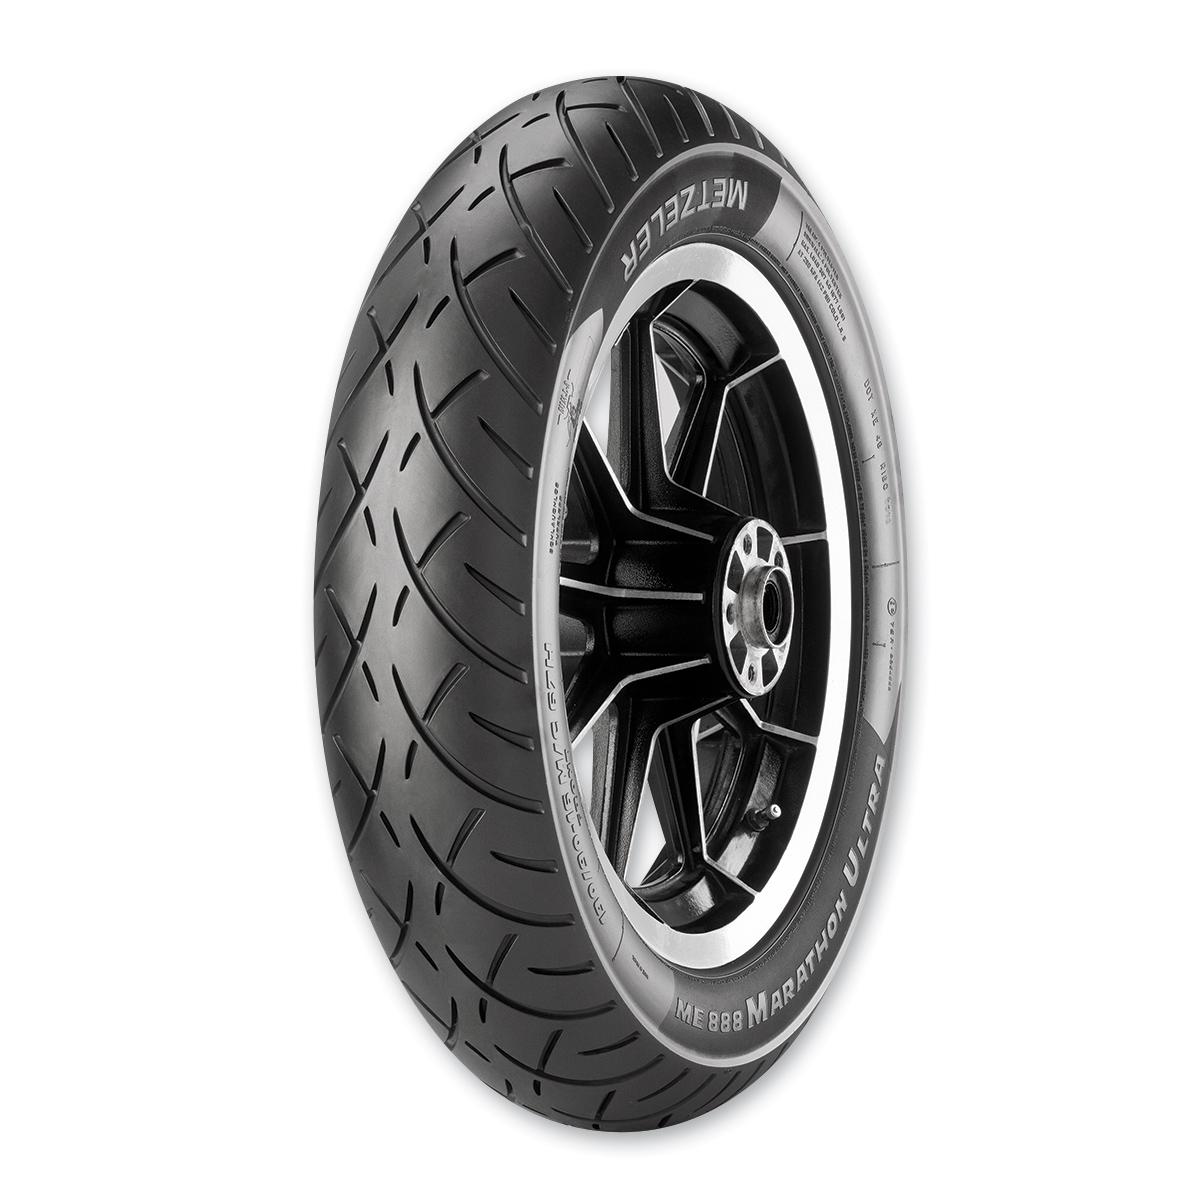 Metzeler ME888 Marathon Ultra 130/90B16 Front Tire